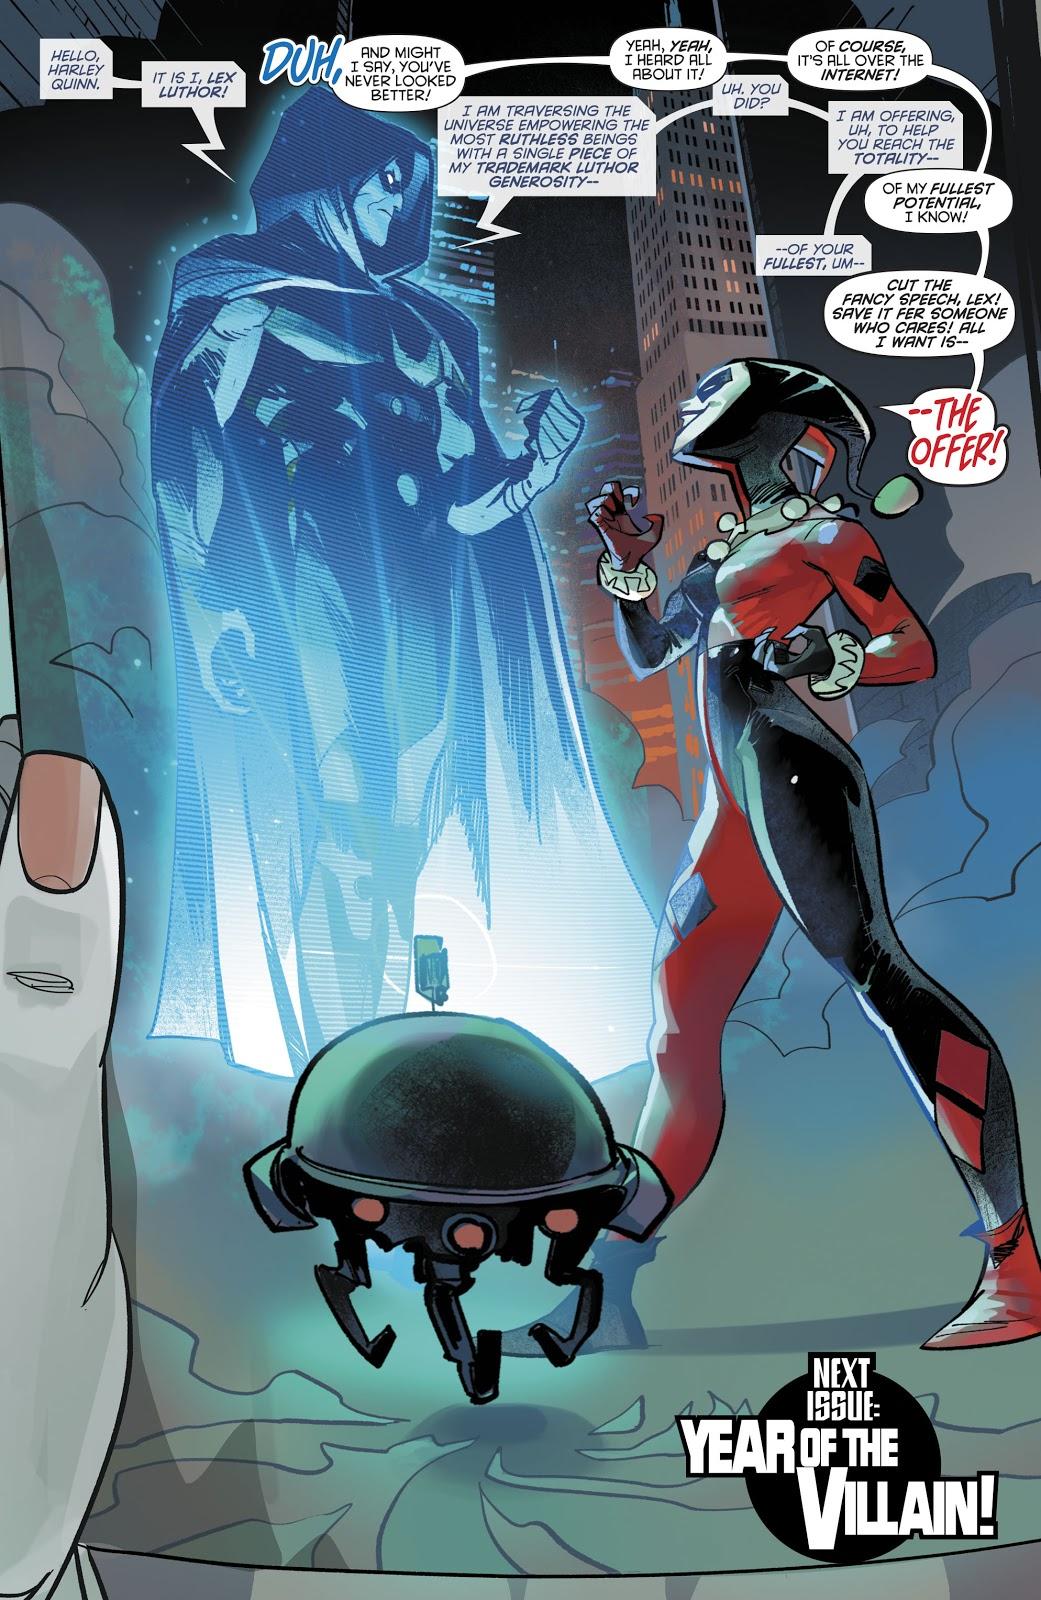 Lex Luthor (Harley Quinn Vol. 3 #63)